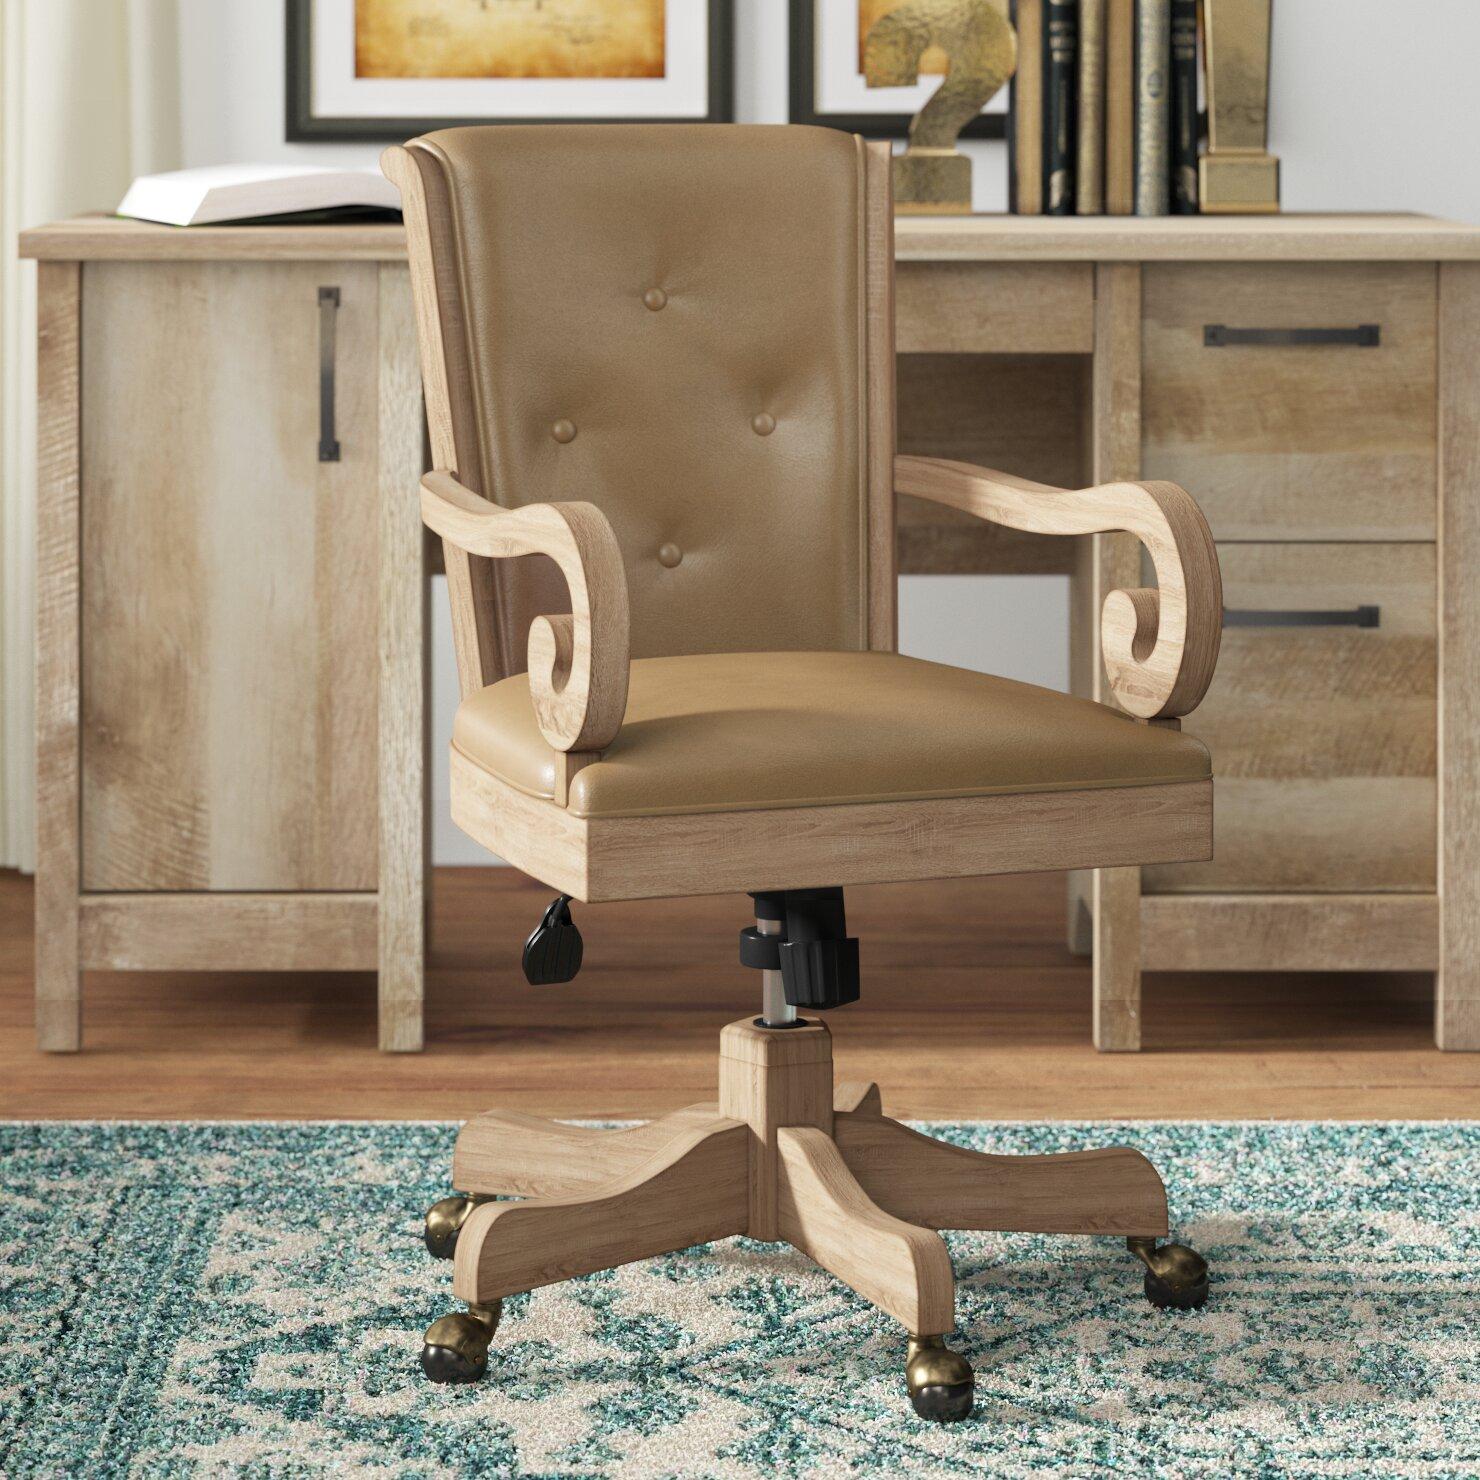 Ellenton Coffee Table With Storage: Greyleigh Ellenton Task Chair